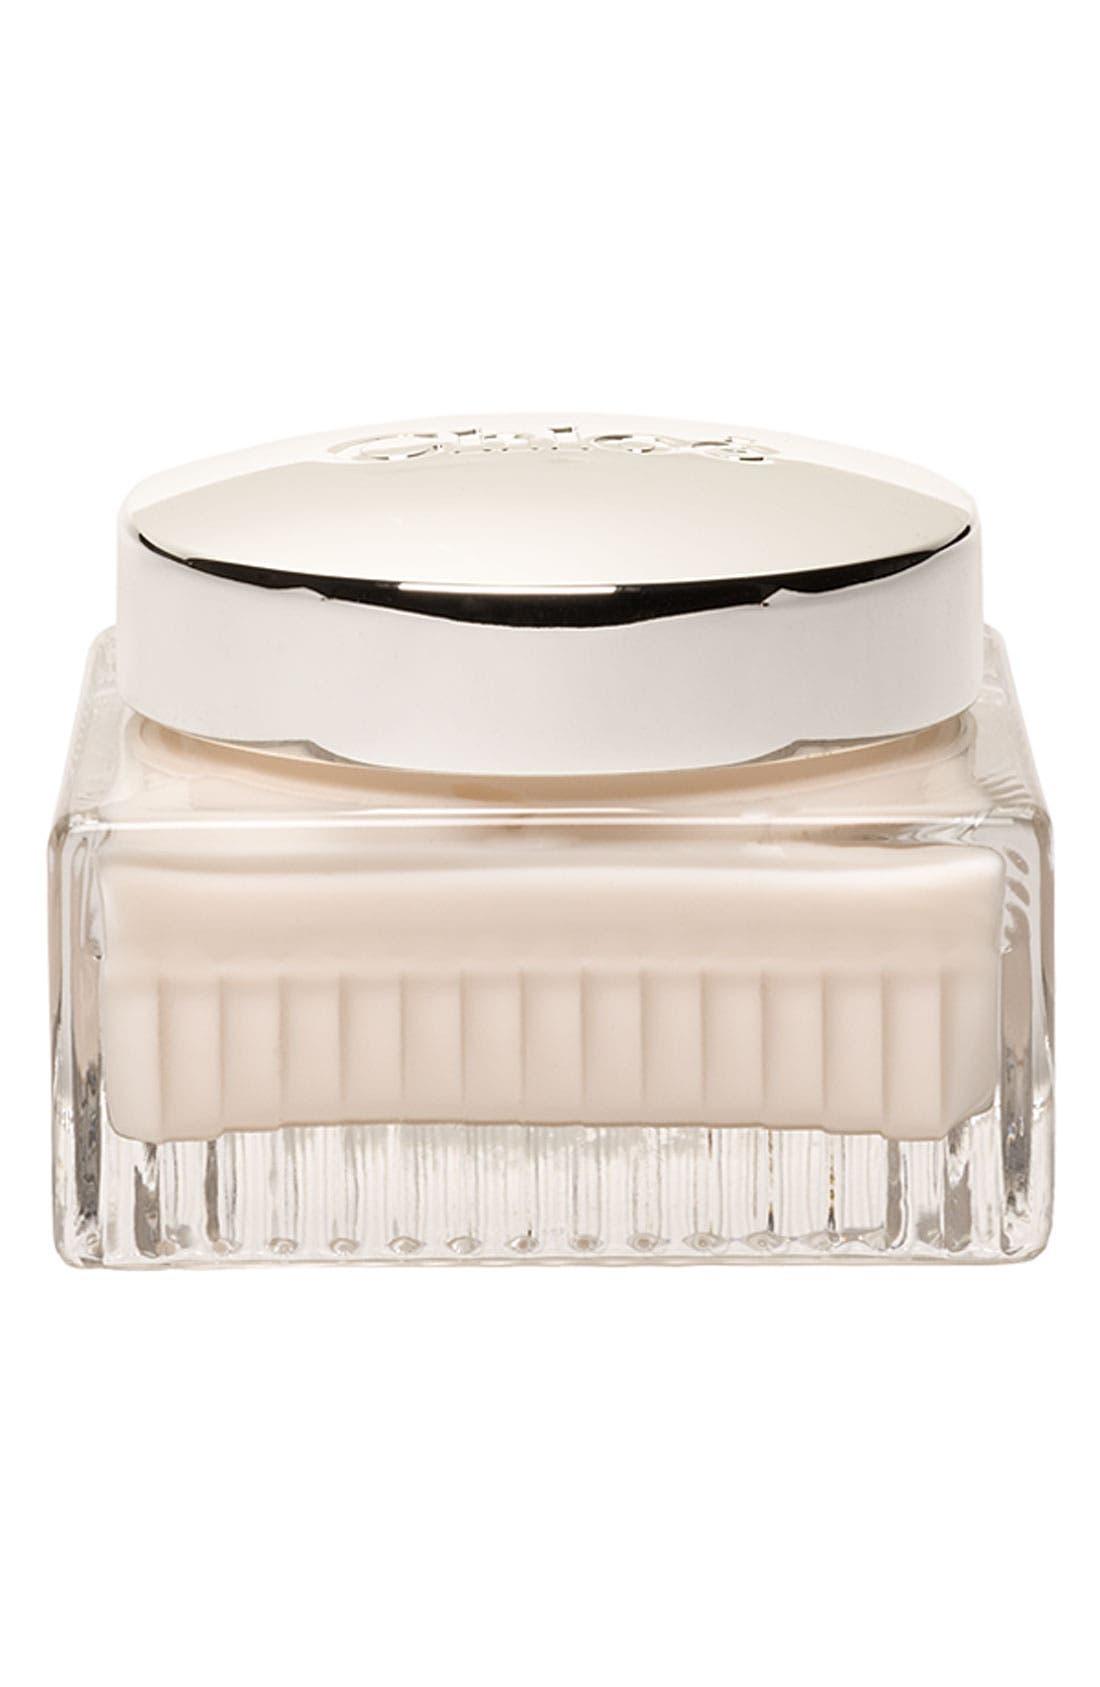 Chloé Perfumed Body Creme